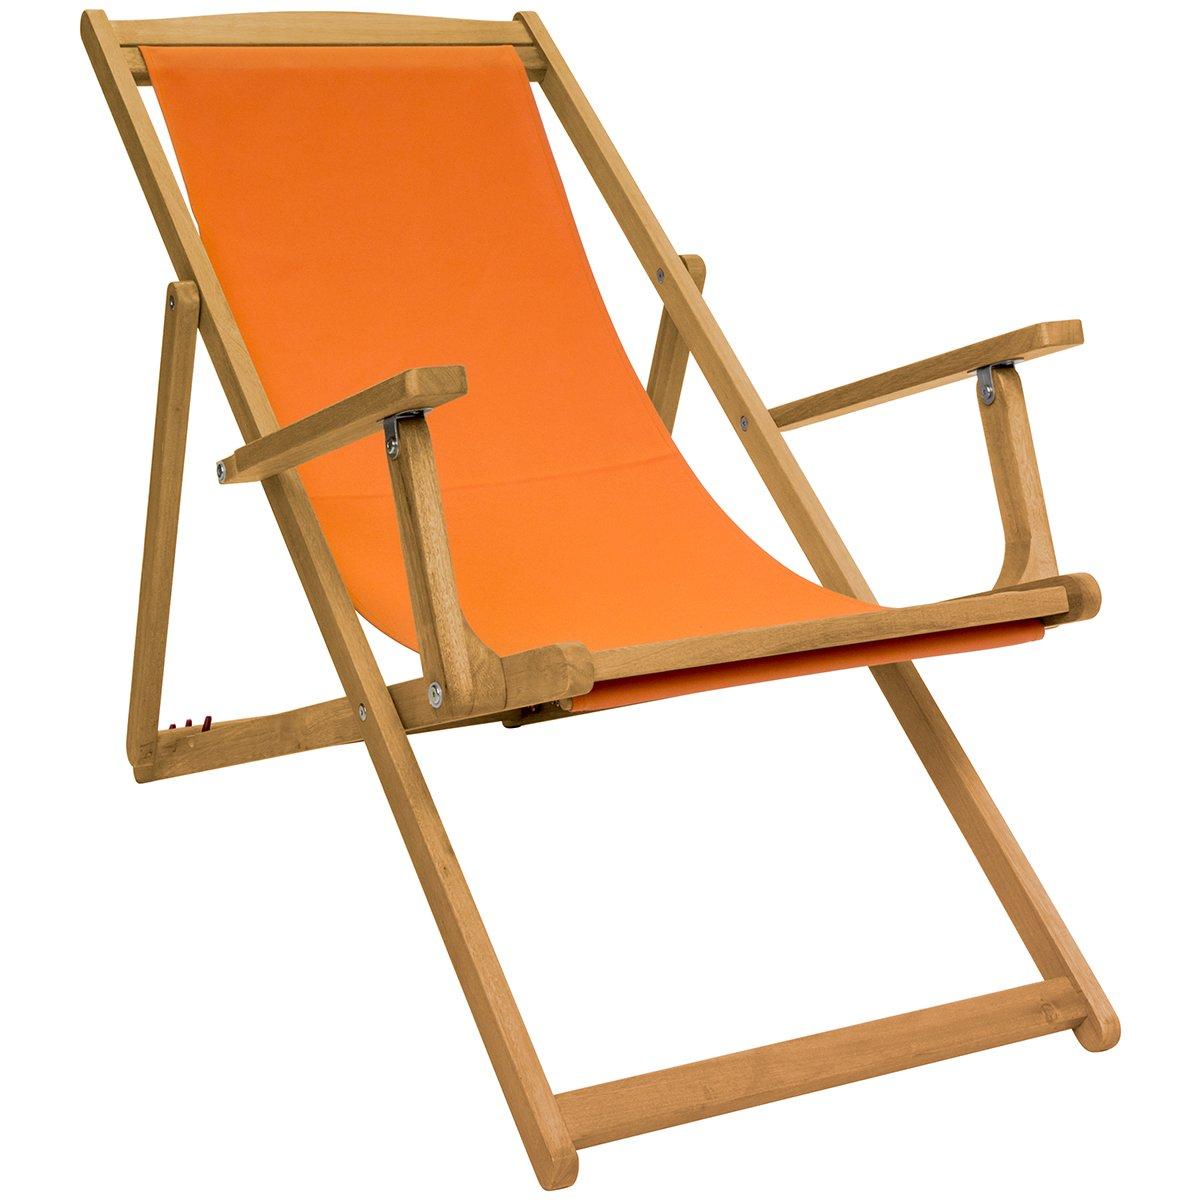 Orange Charles Bentley FSC Eucalyptus Wooden Foldable Deck Chair